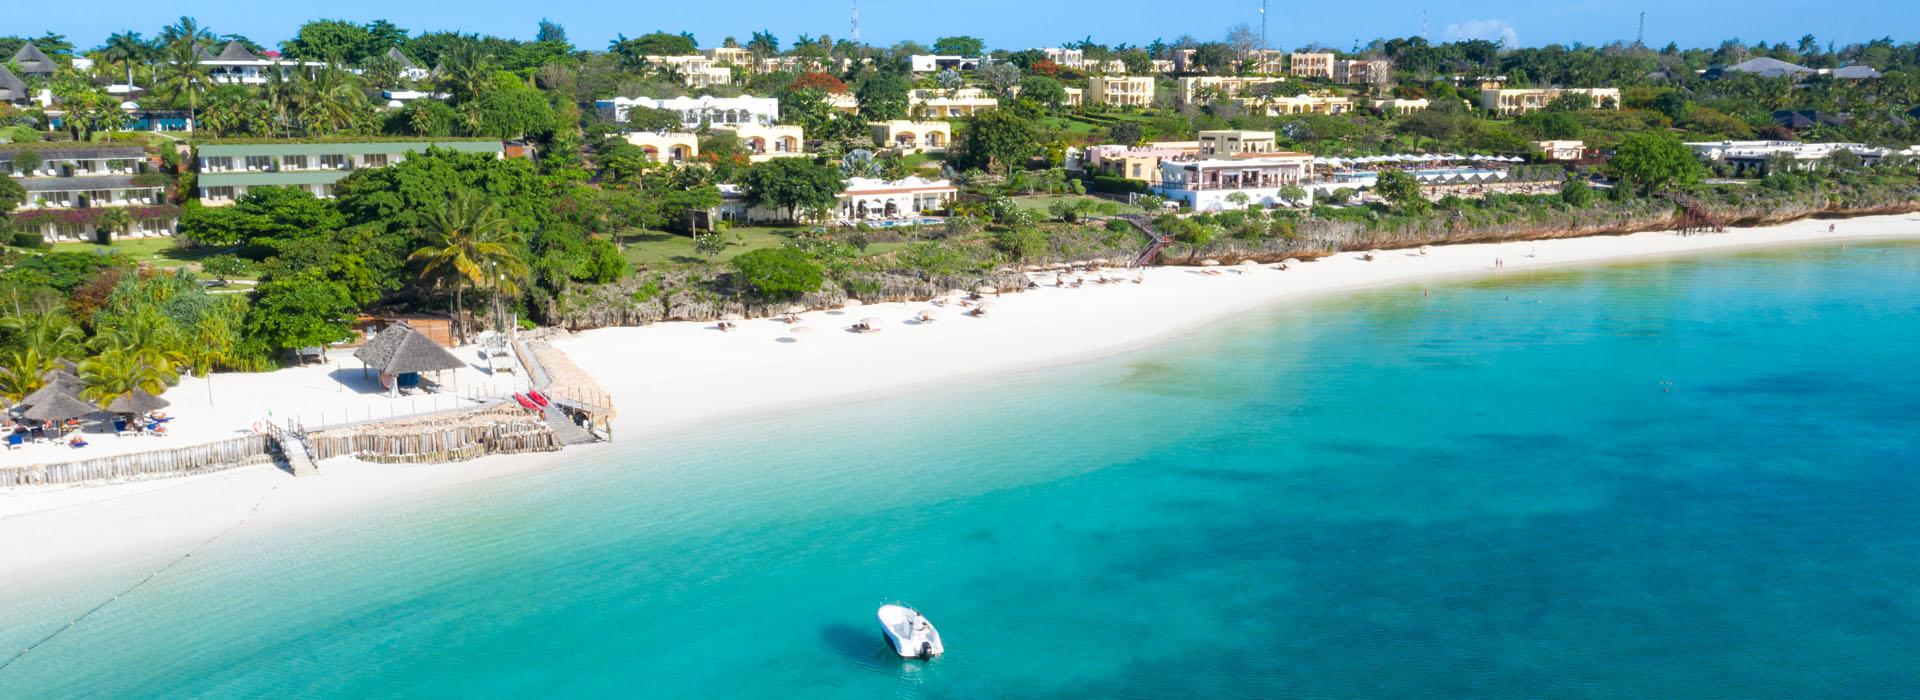 NUNGWI BEACH - Zanzibar Top Destinationi - African Adventure Specialists